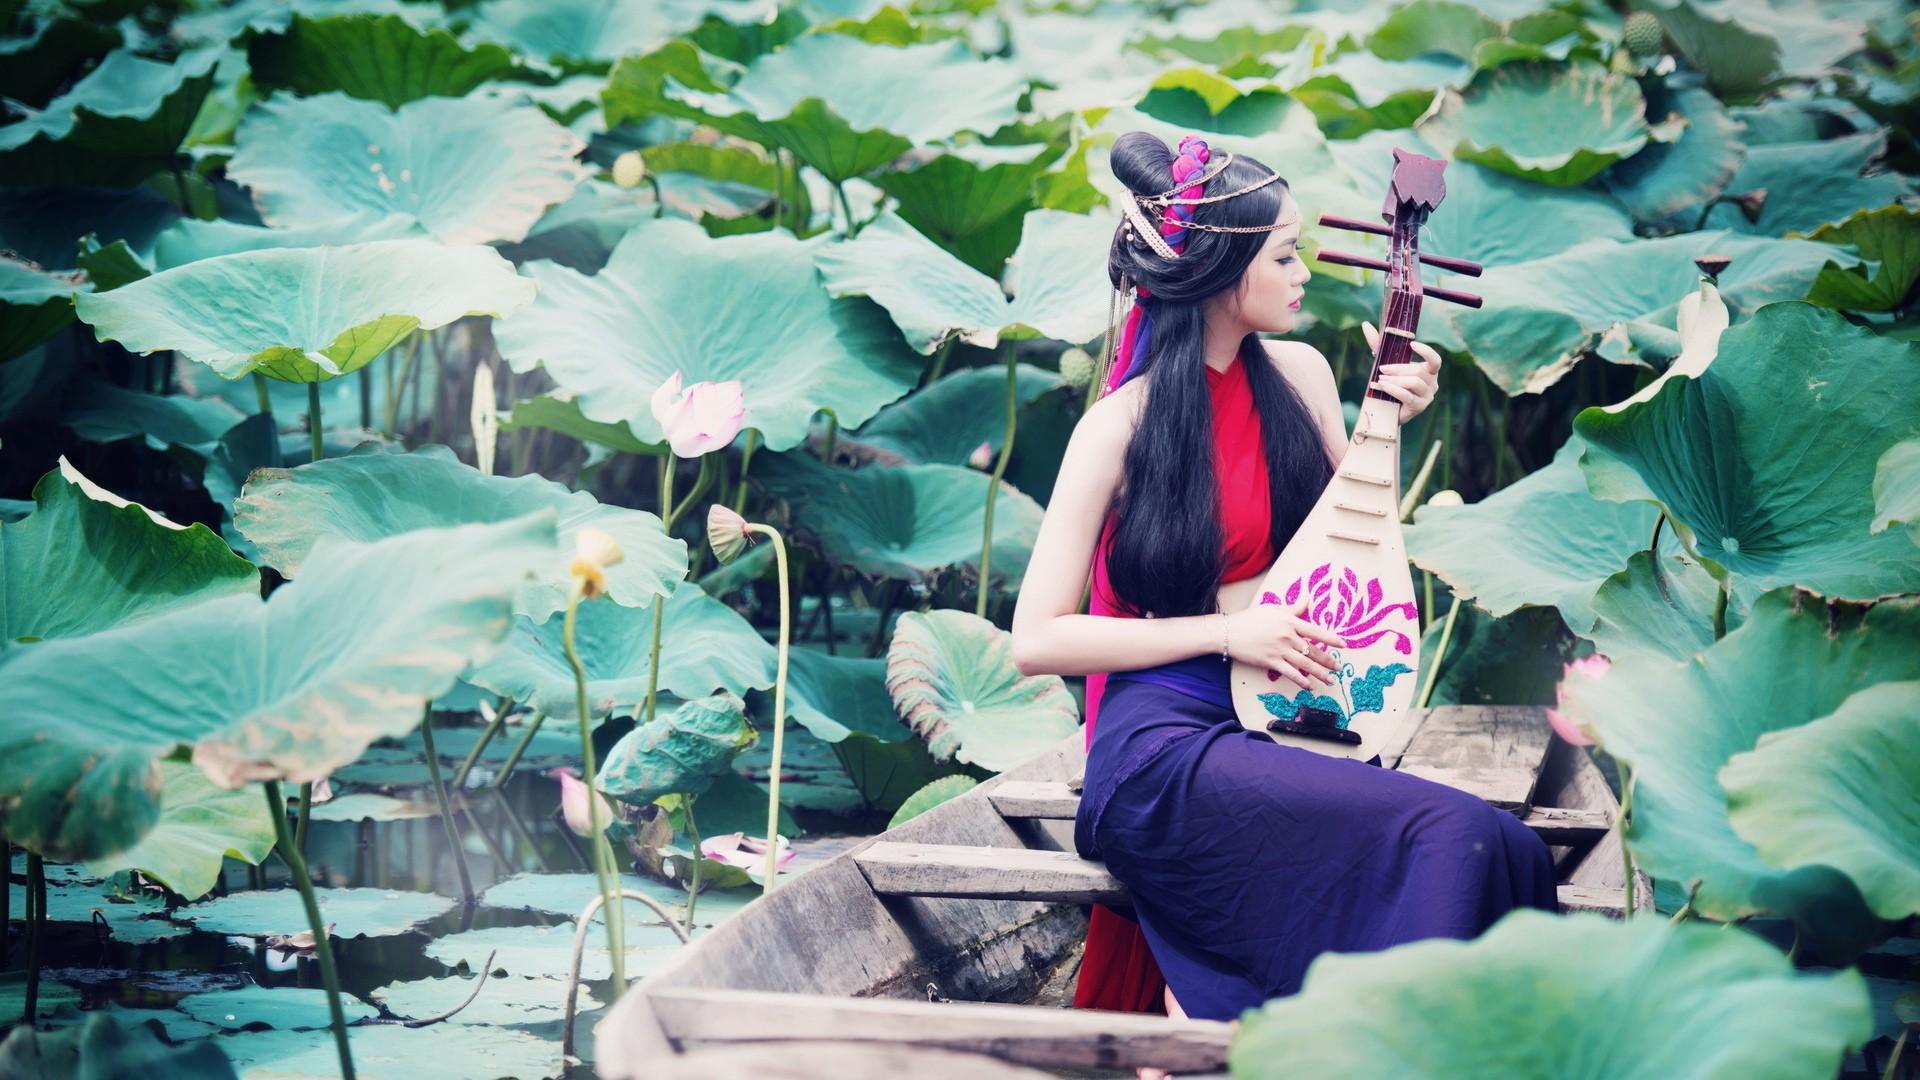 Fantastic Wallpaper Music Spring - leaves-boat-women-outdoors-women-model-flowers-long-hair-lake-water-nature-Asian-sitting-music-green-blue-dark-hair-spring-playing-water-lilies-color-flower-beauty-season-146673  Photograph_866551.jpg